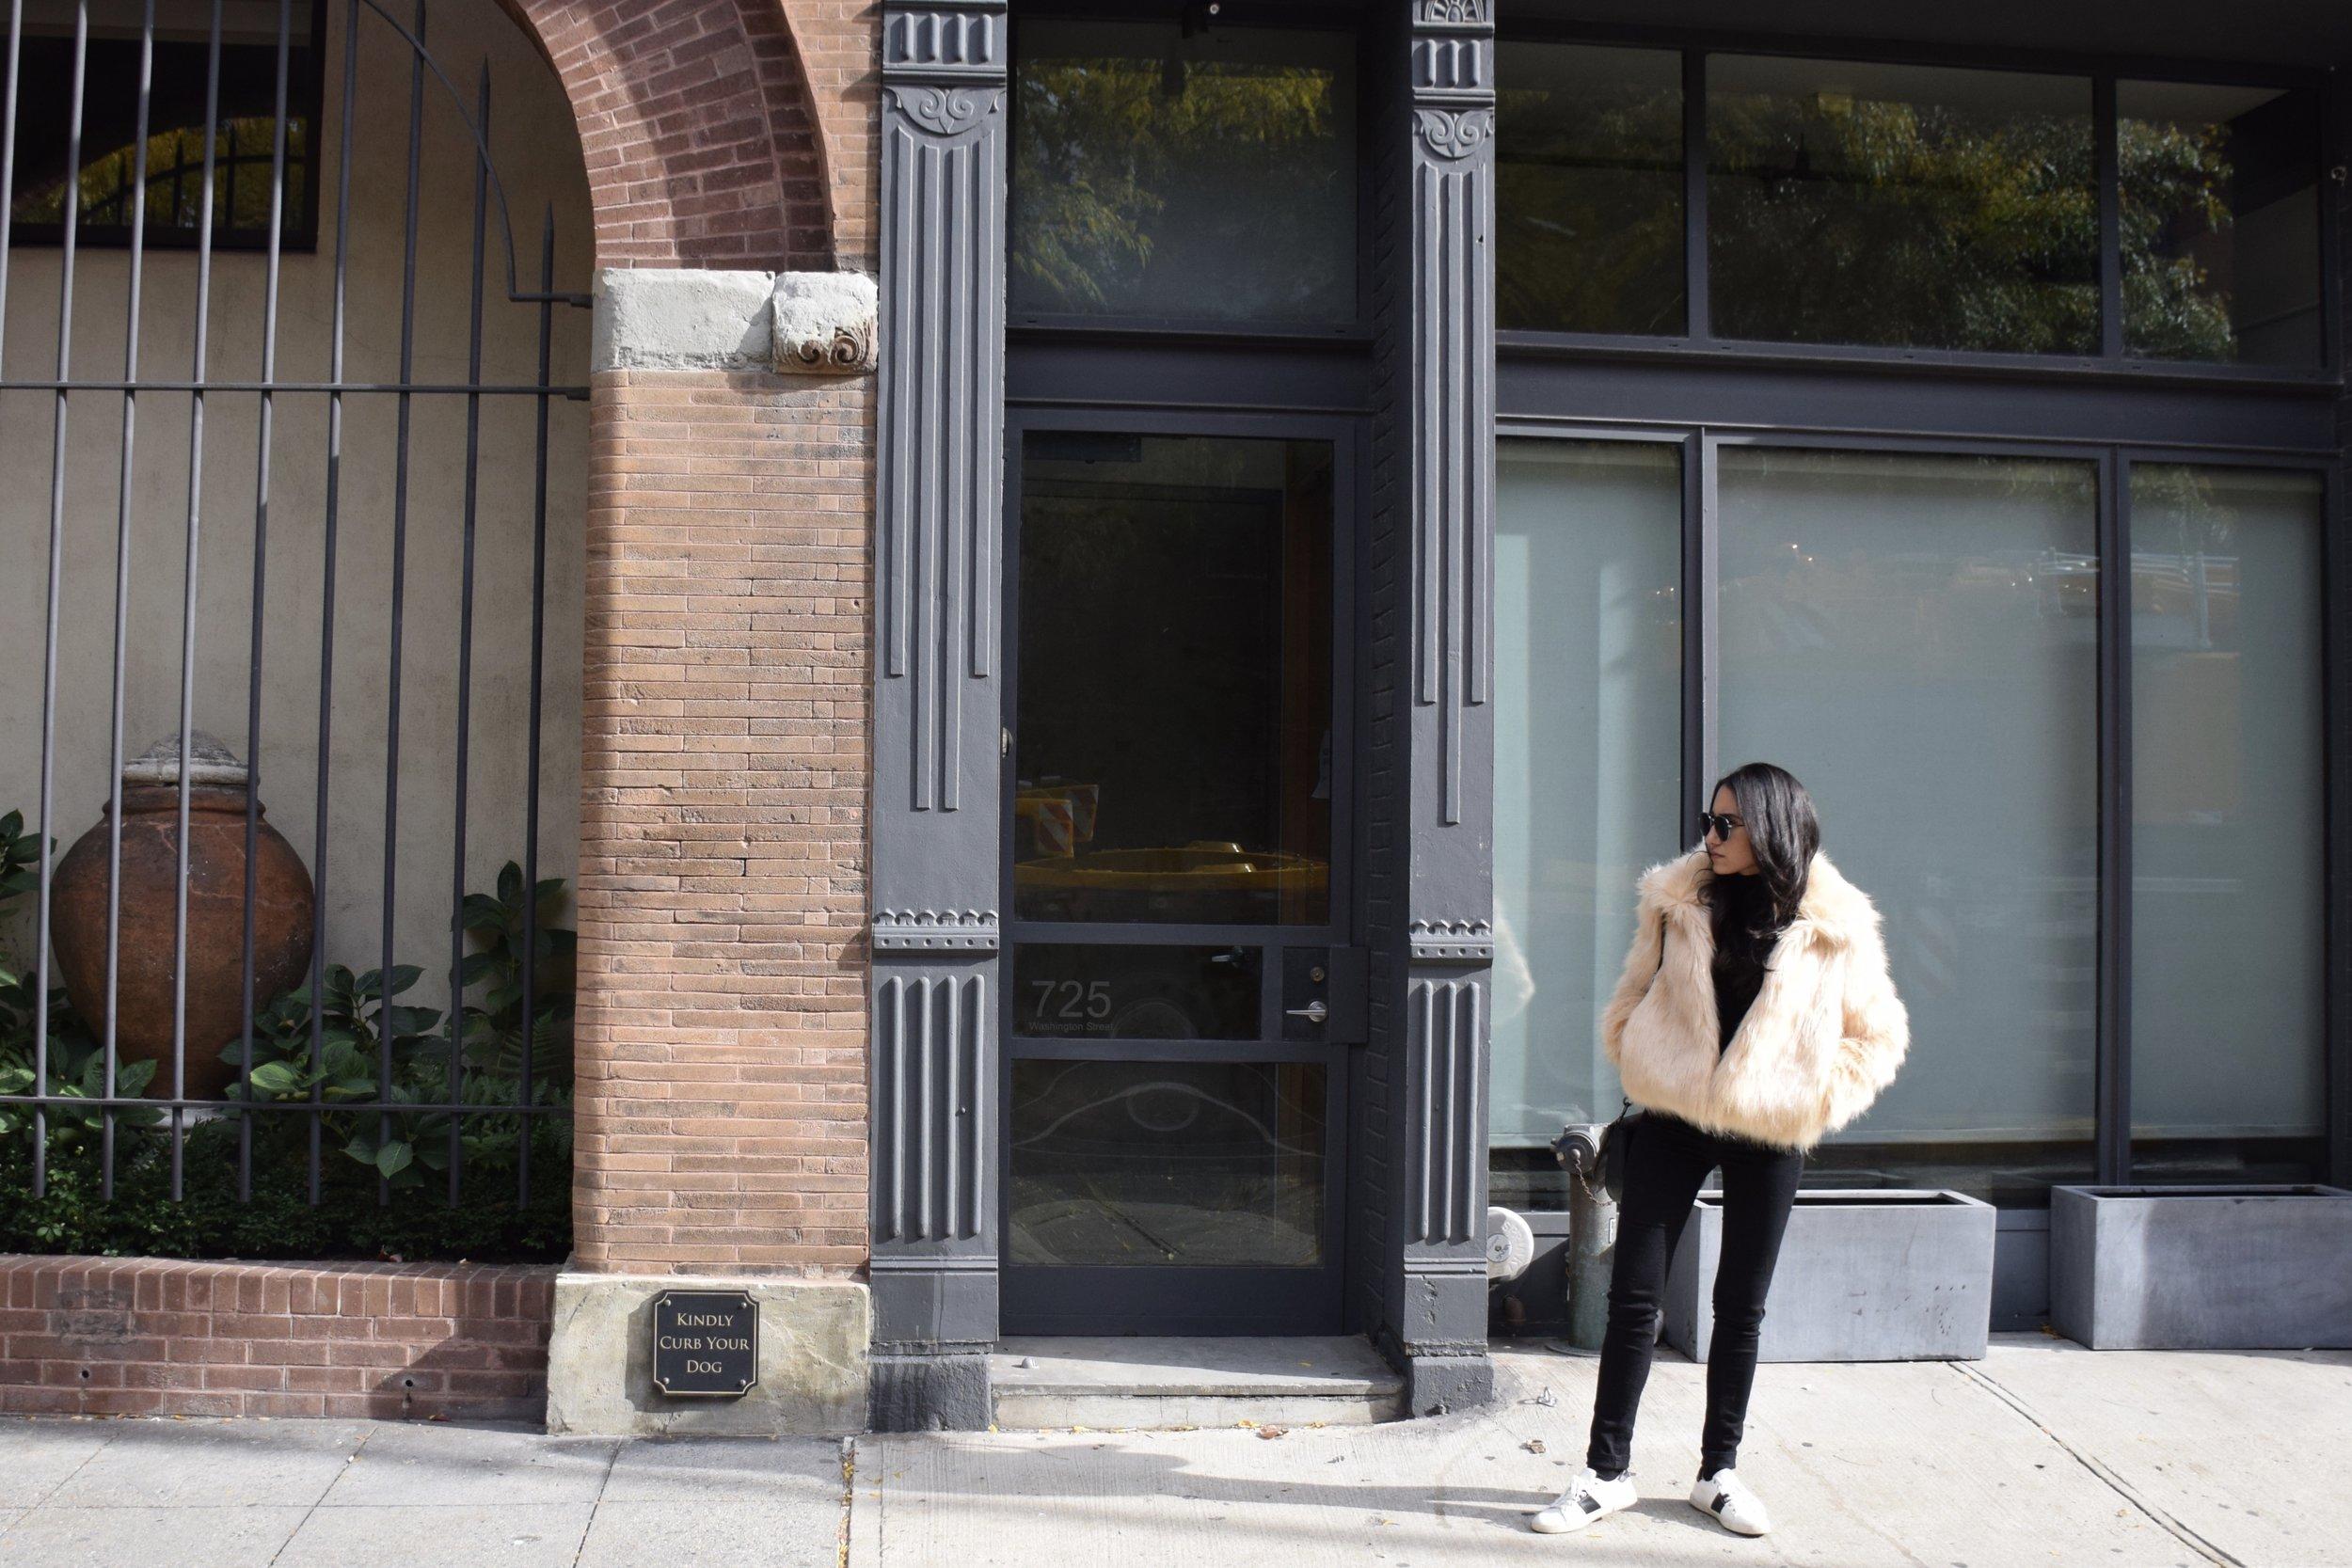 Wearing : F21   c    oat  | Marc Jacobs   b  ag  | Rag & Bone   j    eans